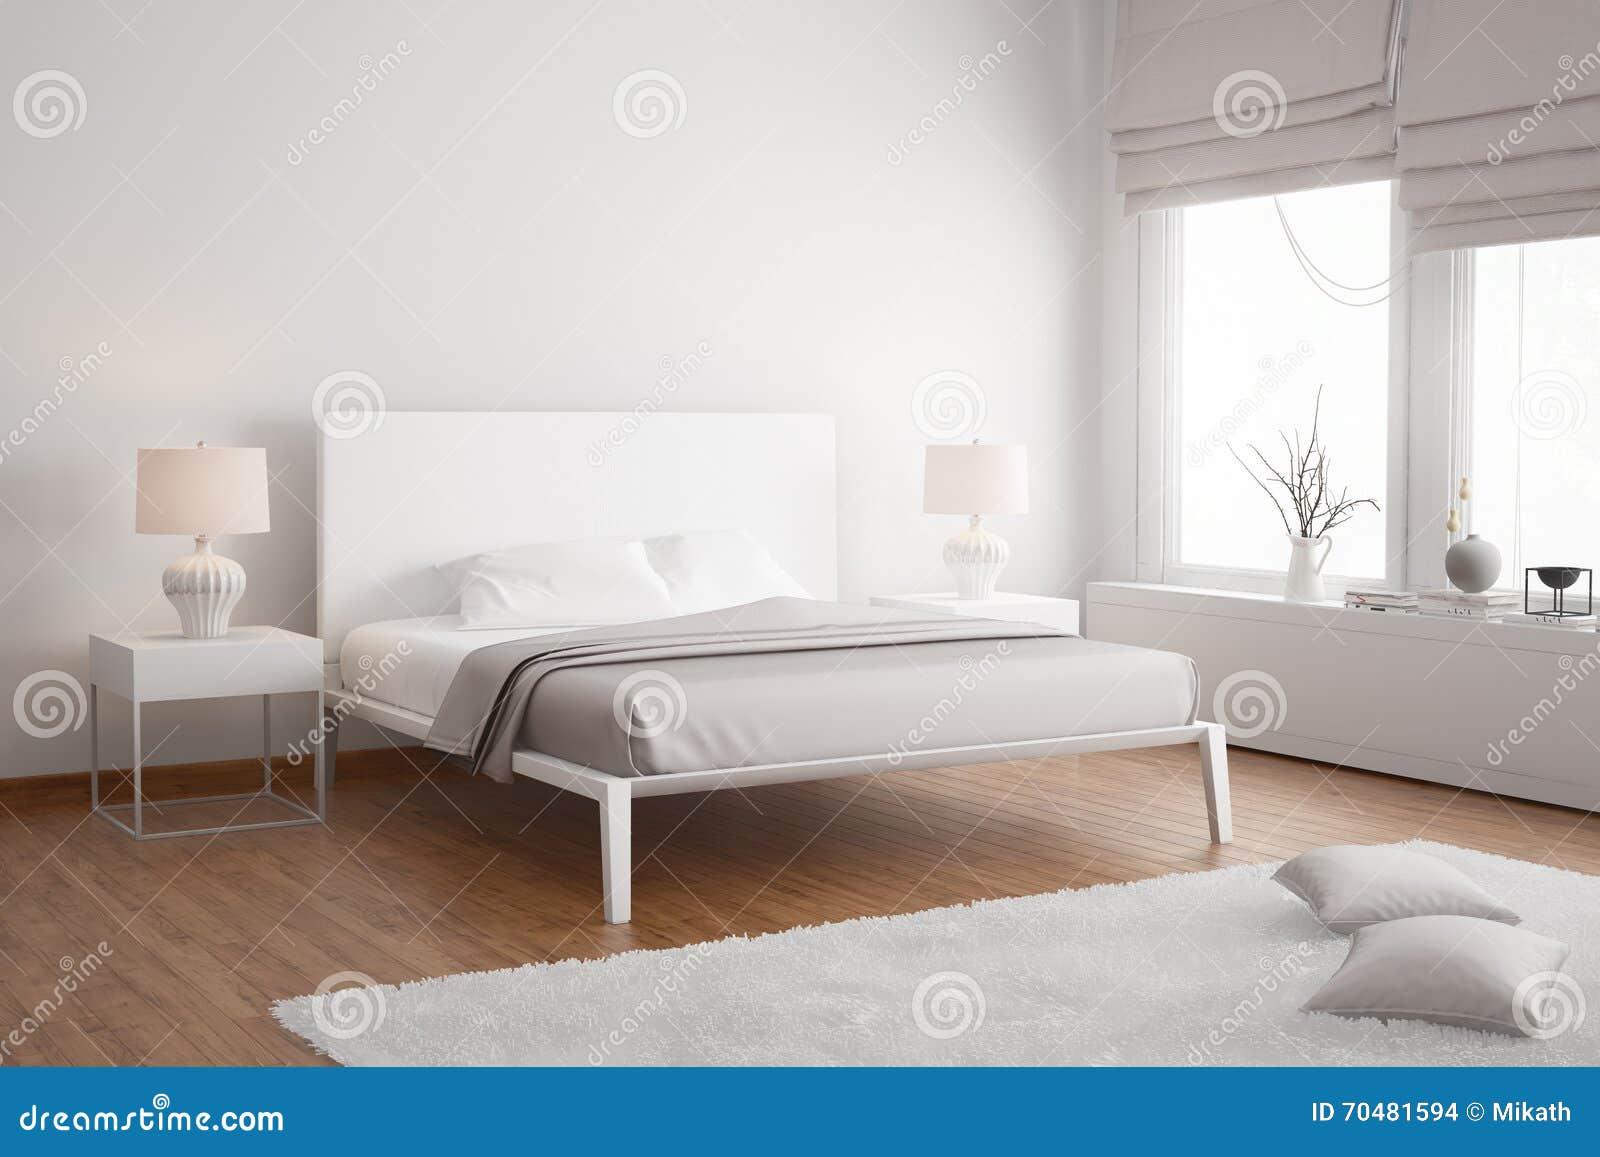 Moderne Witte Slaapkamer : Moderne witte eigentijdse slaapkamer stock illustratie